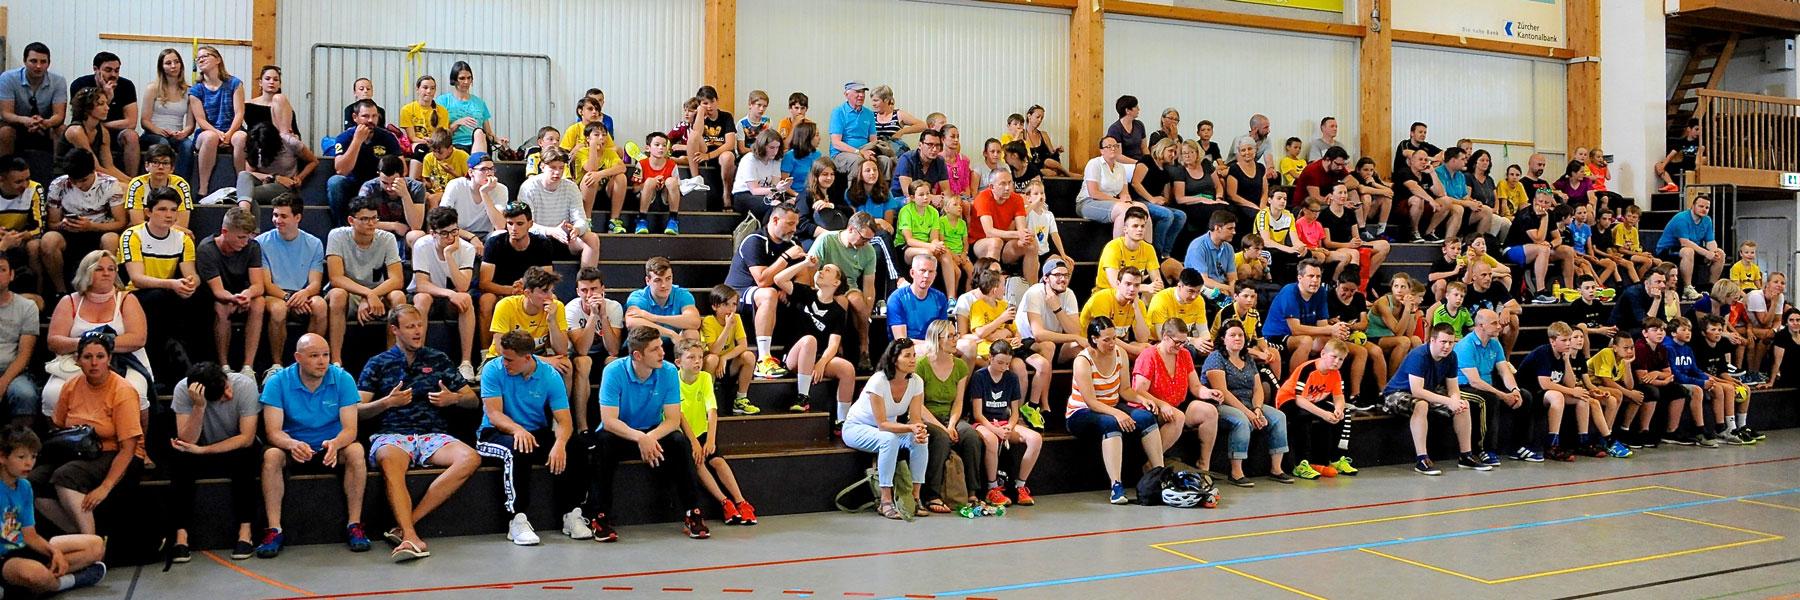 handball_staefa_home_3